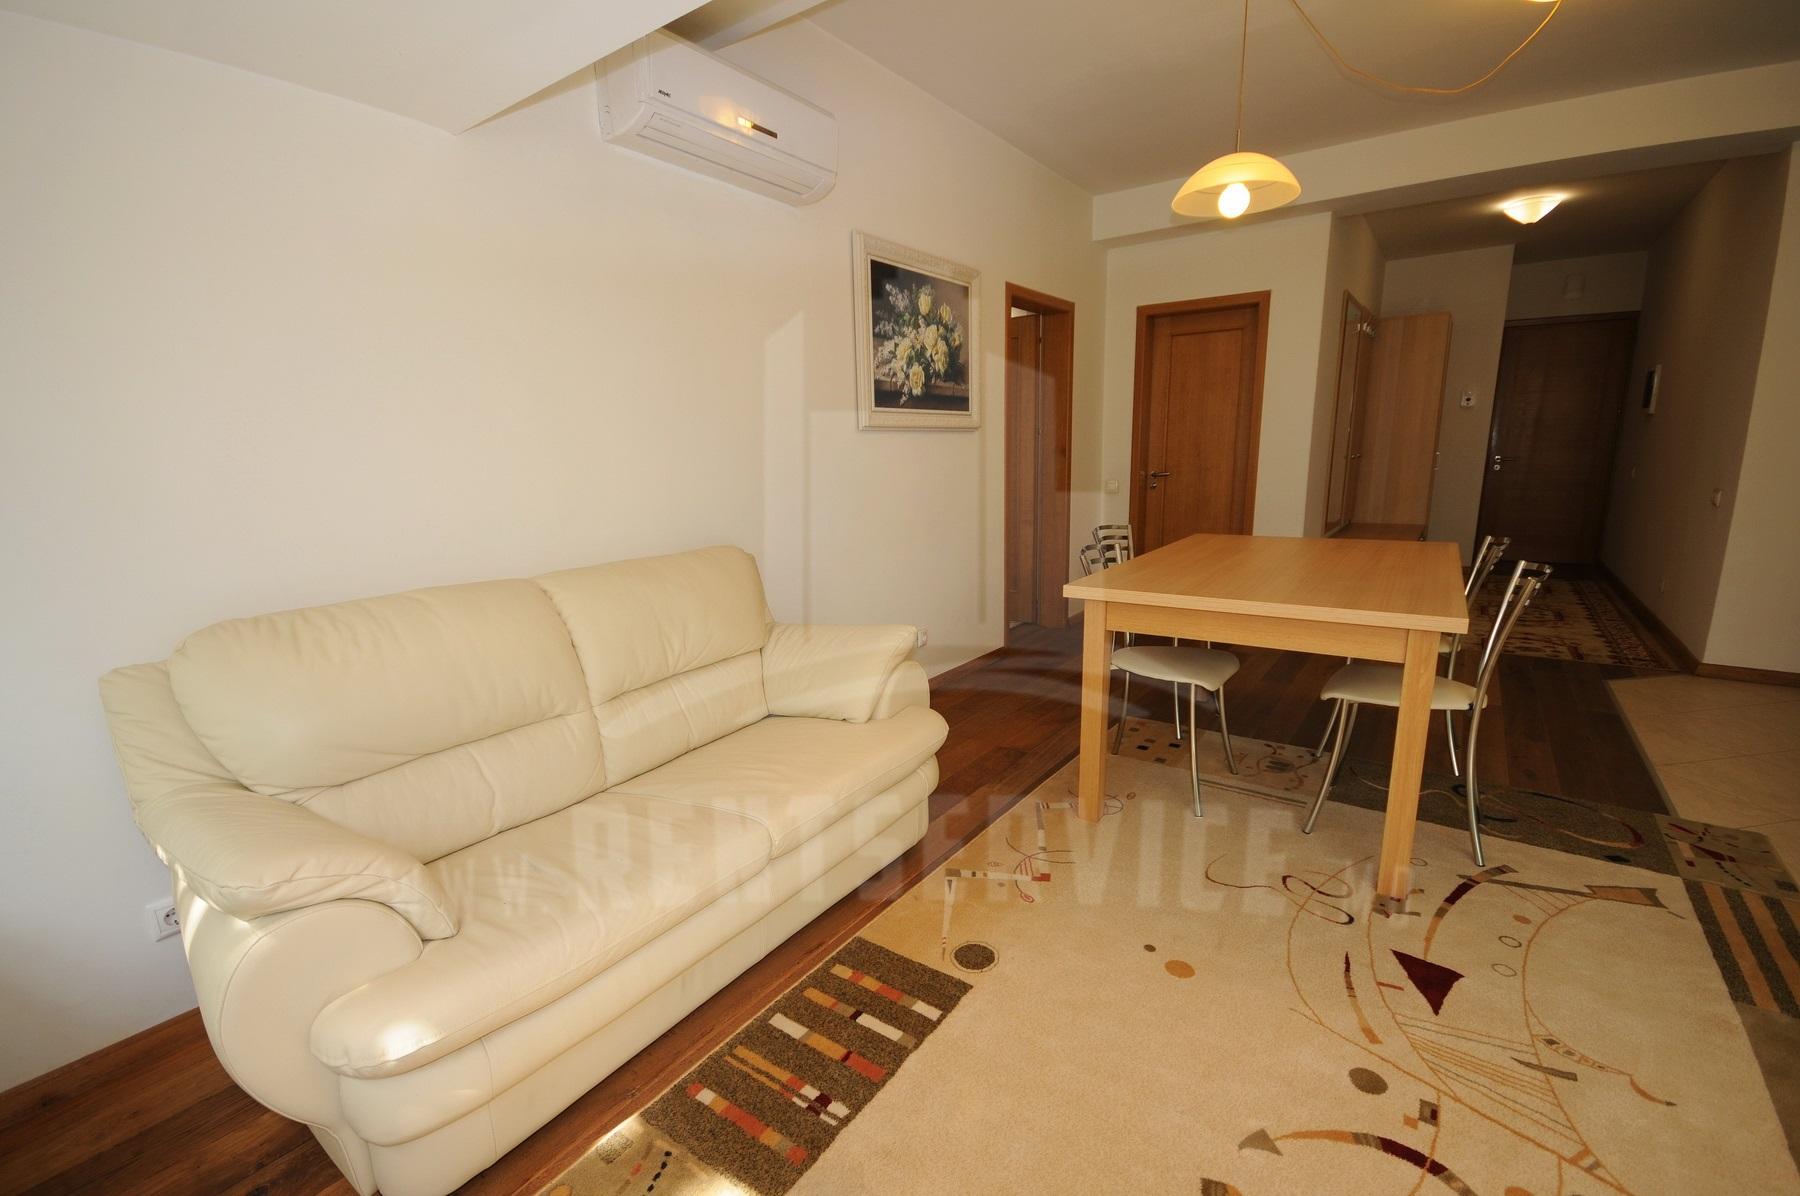 267_apartment_8.JPG